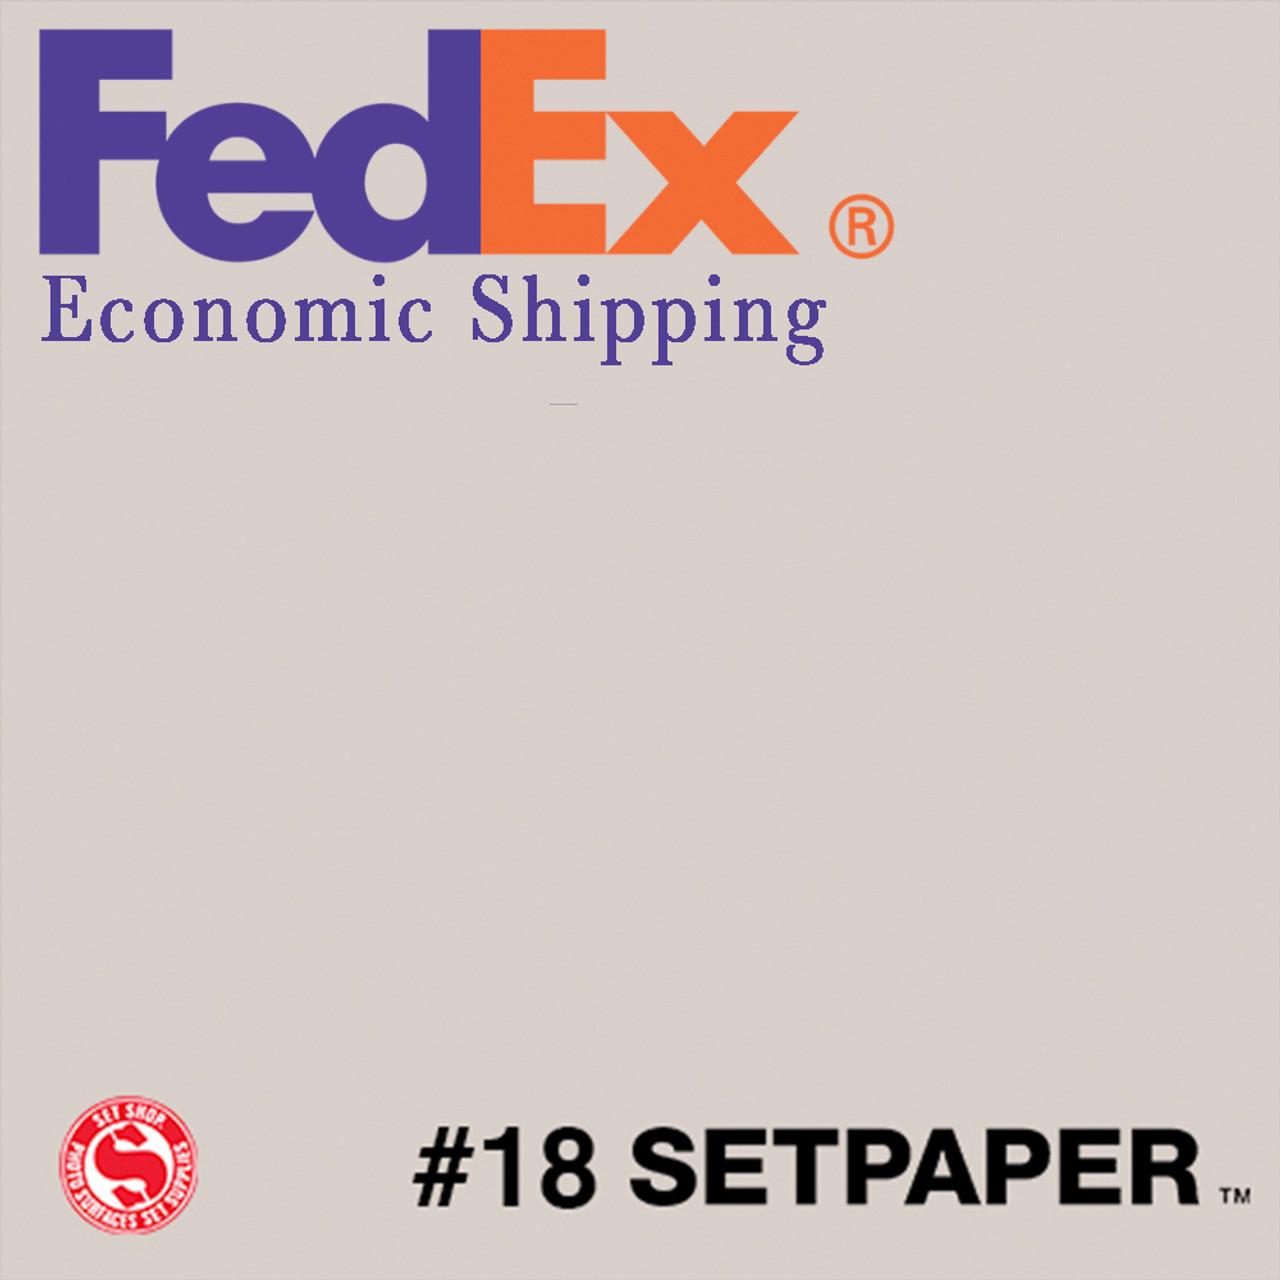 "(ECONOMIC SHIPPING) SETPAPER - DIGI GREY 48"" x 36' (1.3 x 11m)"